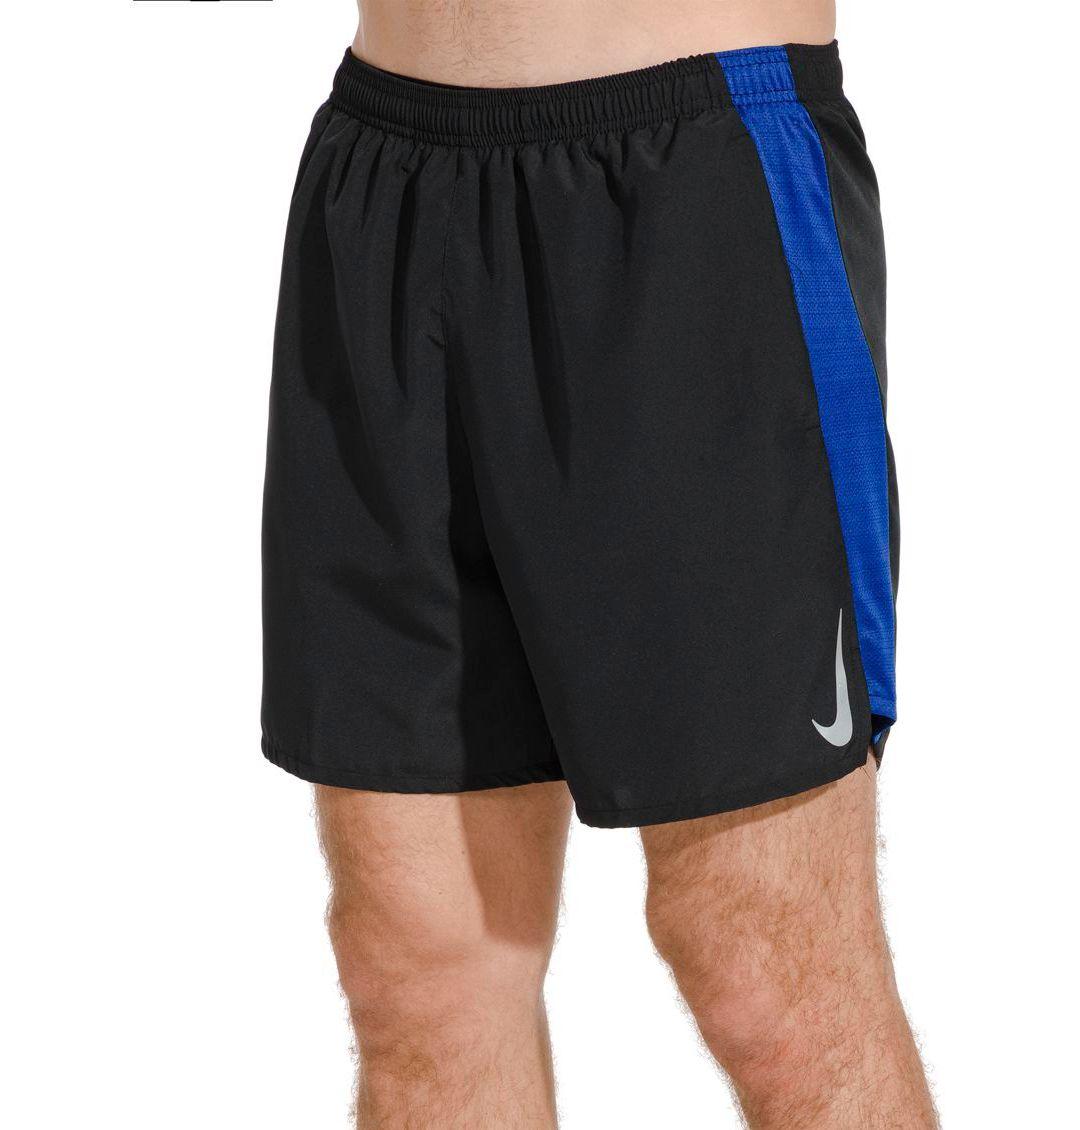 eea9120d6a Nike Men's Challenger Dri-FIT 7'' Running Shorts | DICK'S Sporting Goods